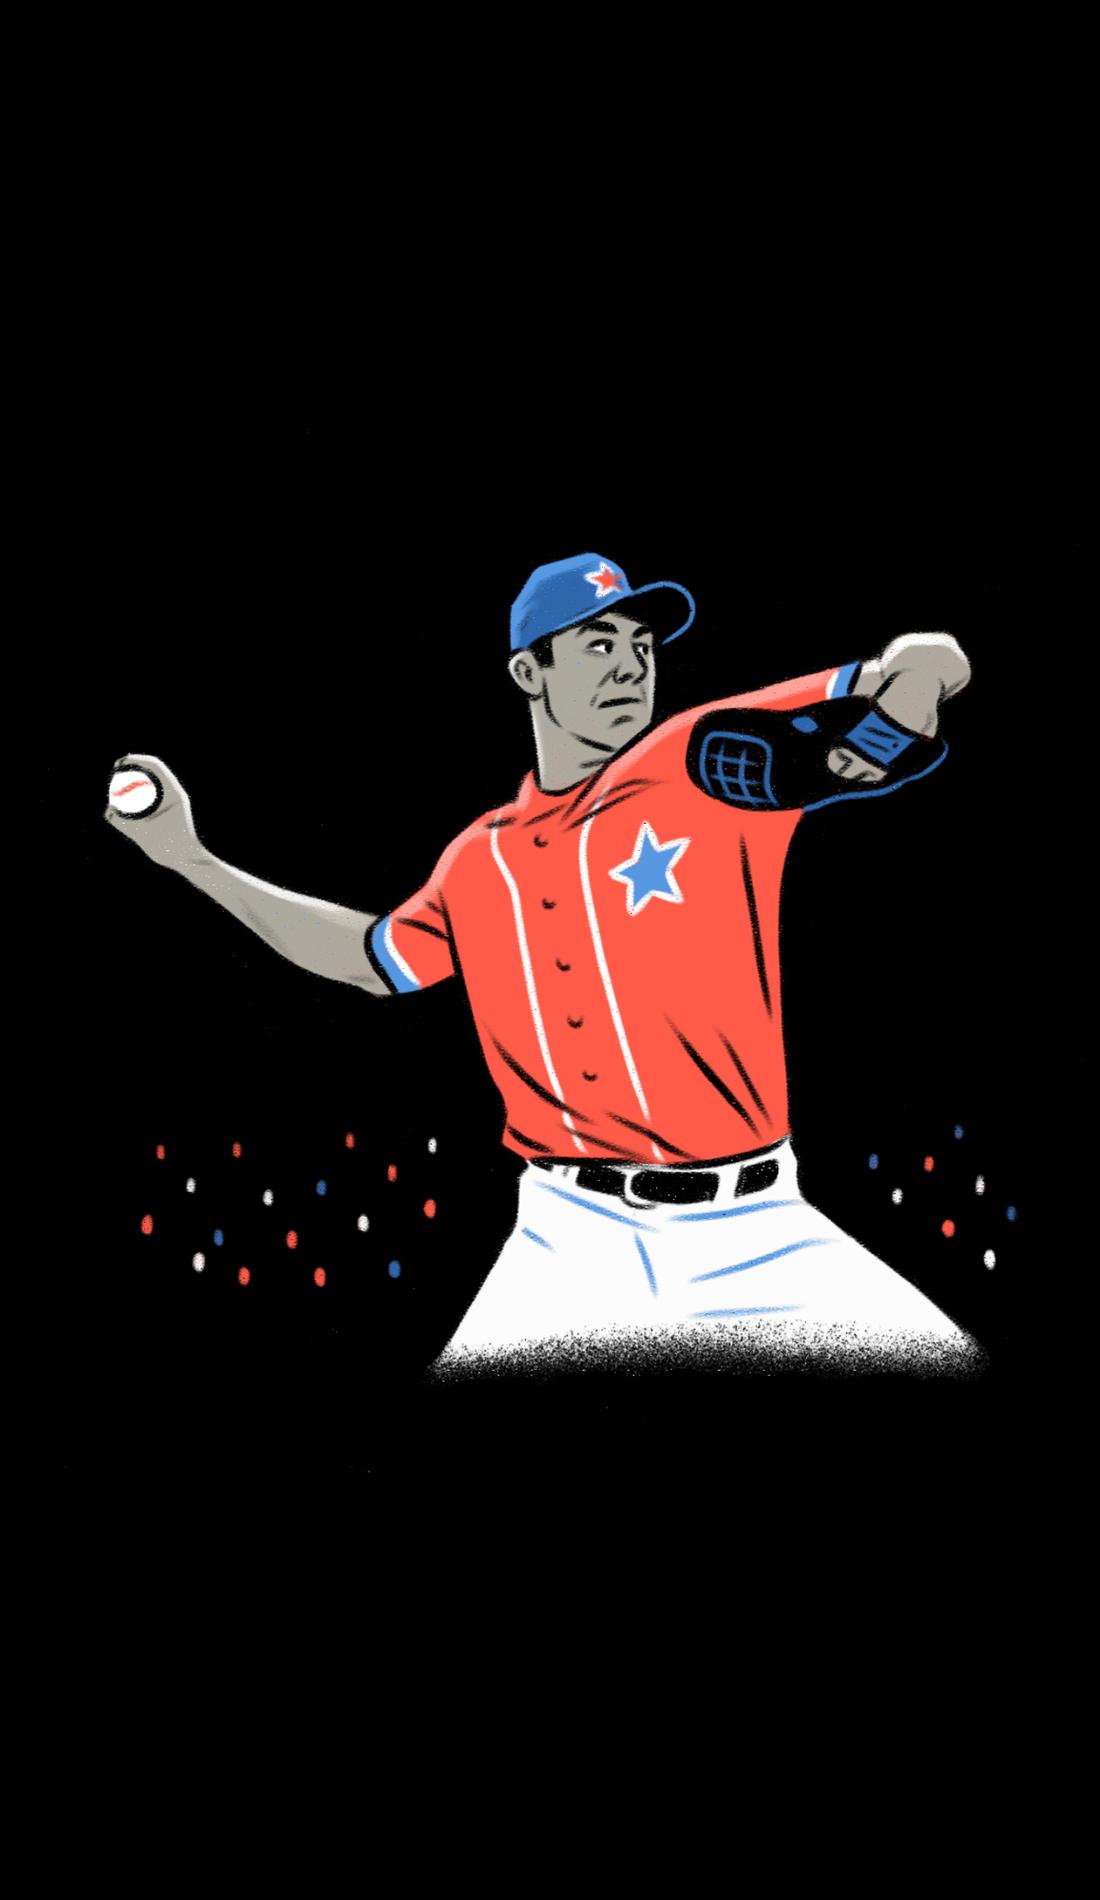 A Louisiana-Lafayette Rajin' Cajuns Baseball live event